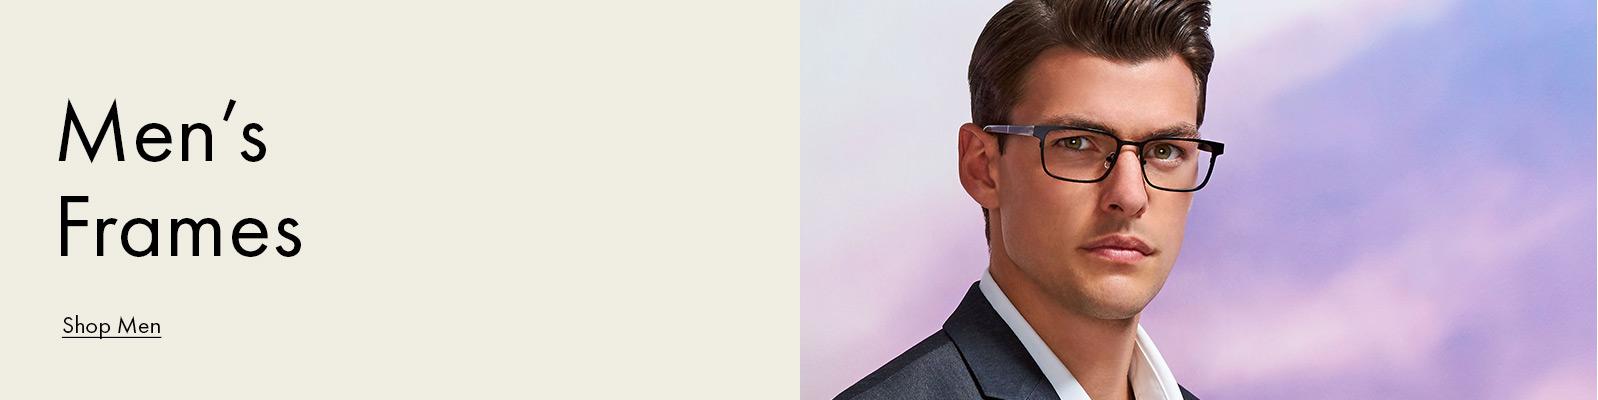 badgley mischka eyewear distinct eyewear for the modern man